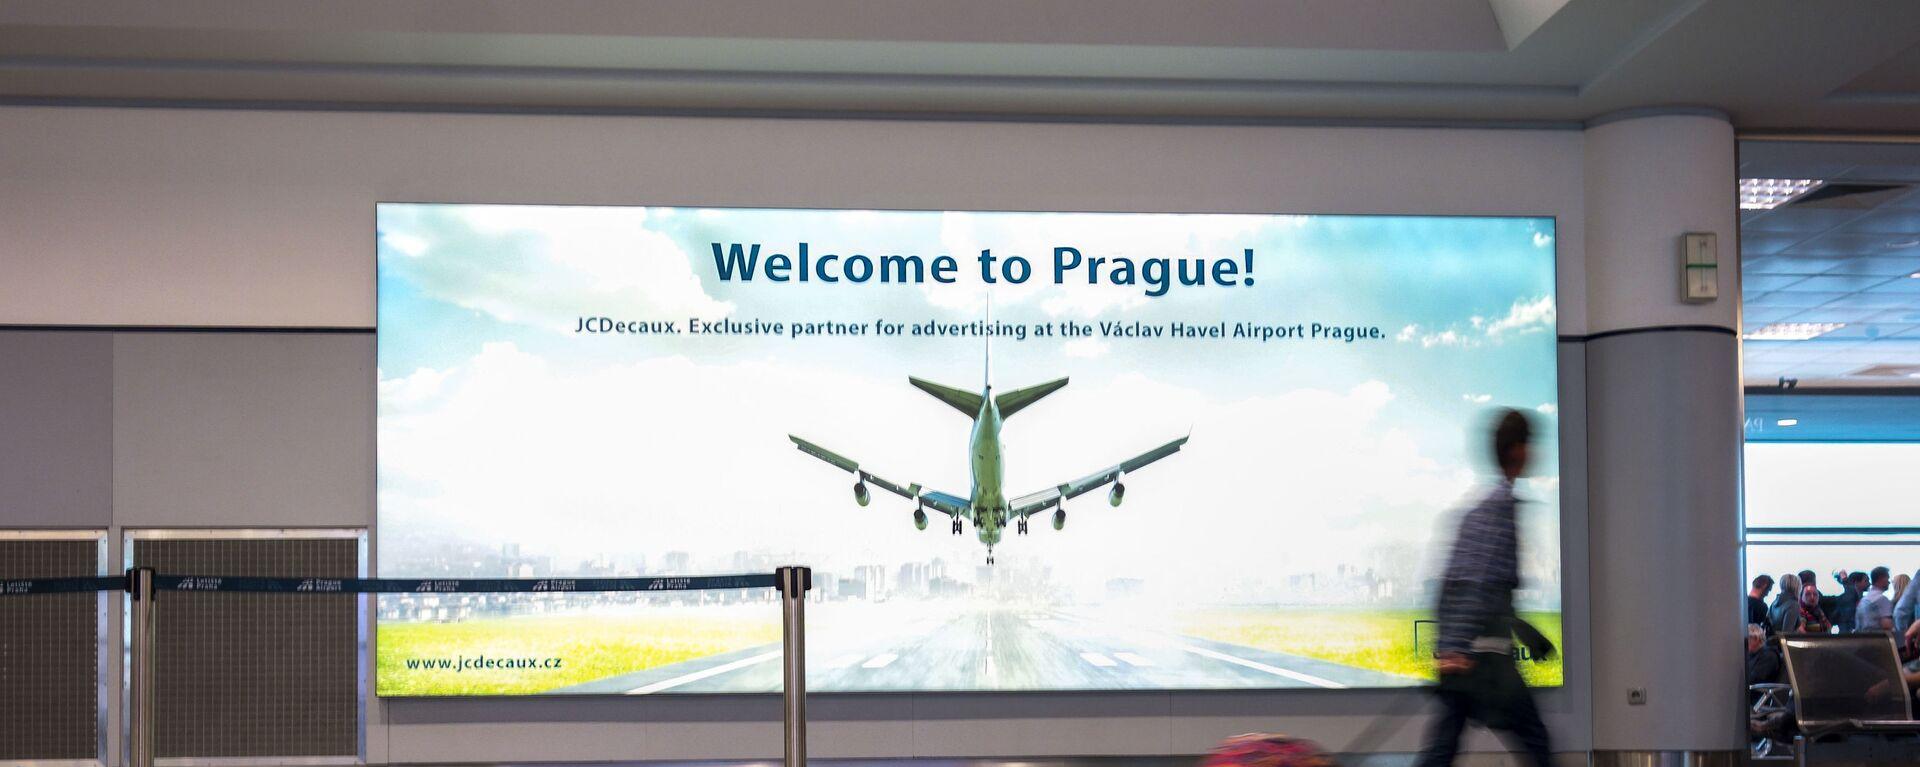 Port lotniczy Praga im. Václava Havla - Sputnik Polska, 1920, 16.08.2021